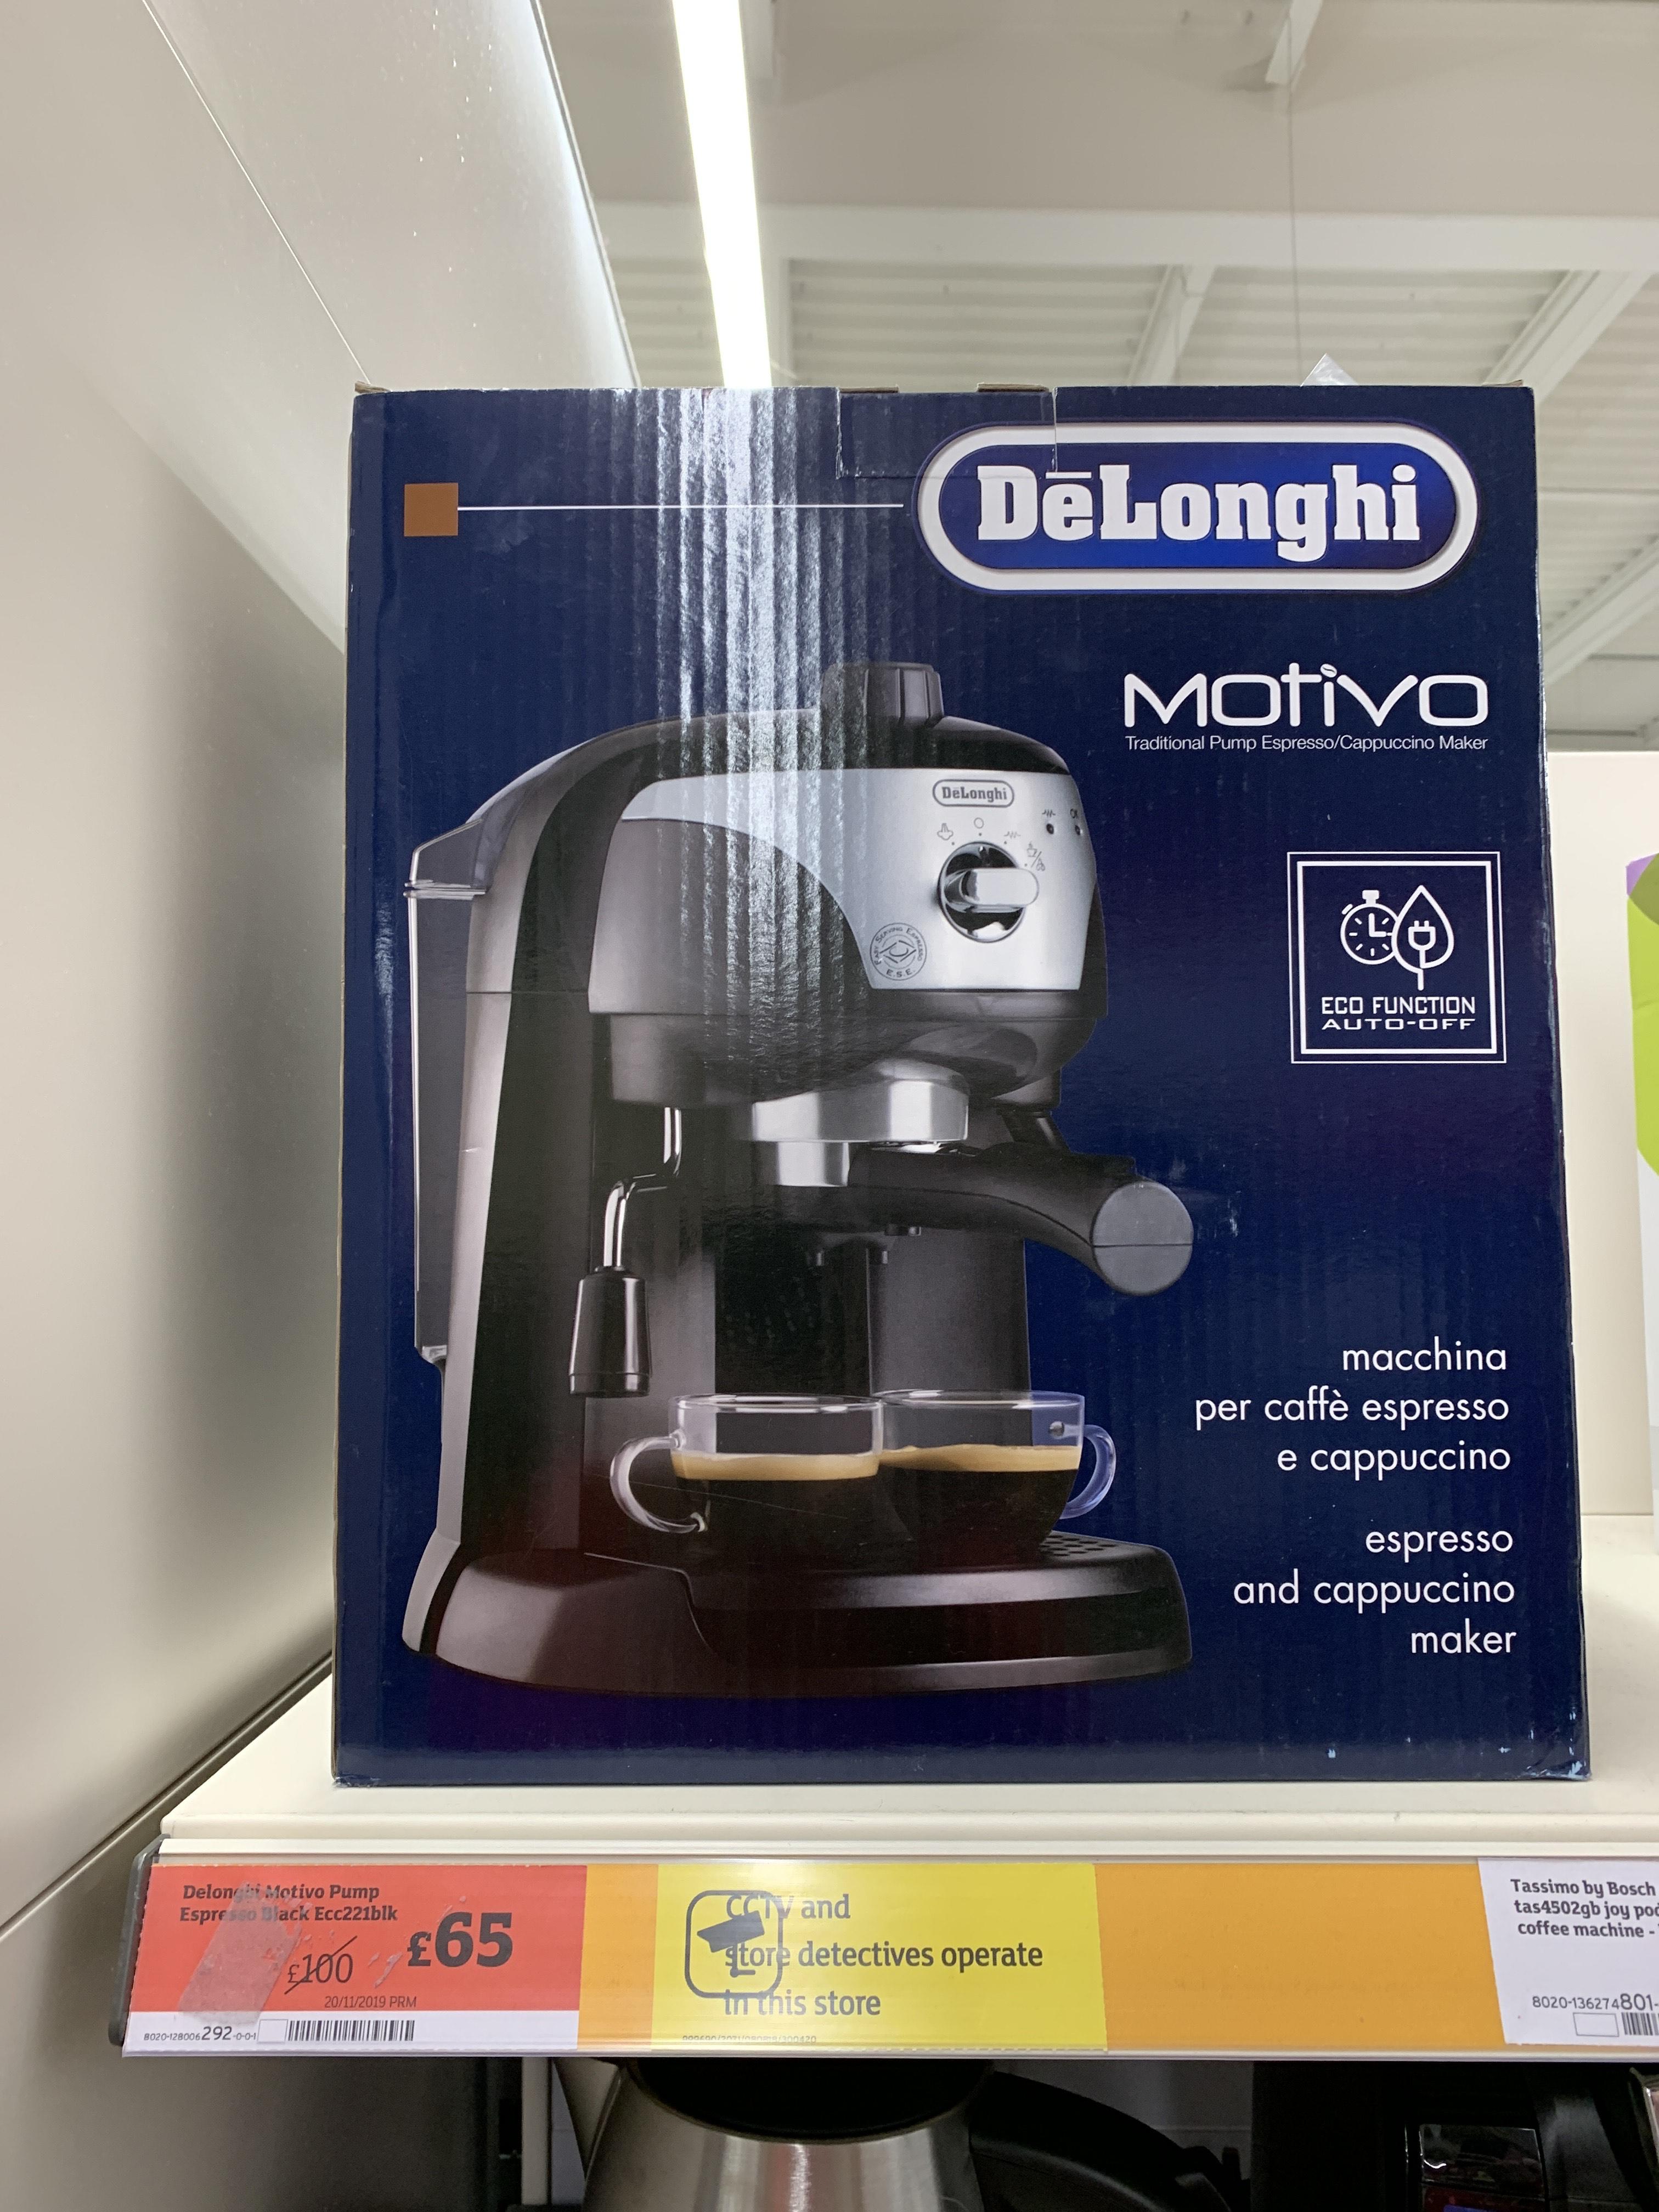 De'Longhi Motivo Espresso Pump - Black £65 at Sainsbury's online/instore